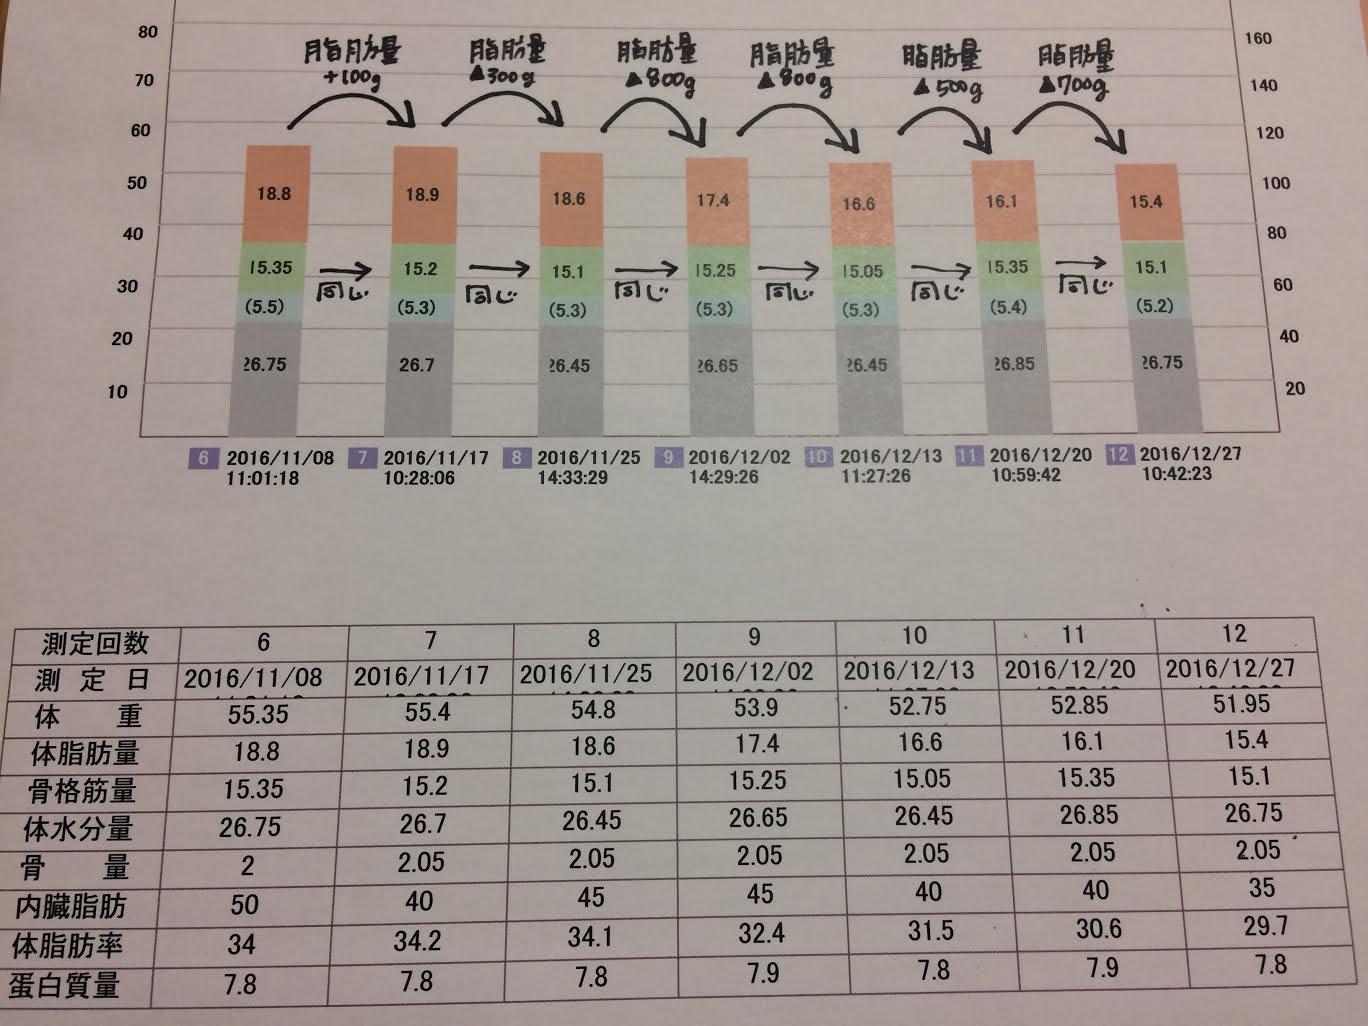 %e8%be%b0%e5%b7%b3%e3%81%95%e3%82%93%ef%bc%91%ef%bc%92%e6%9c%88%ef%bc%92%ef%bc%97%e6%97%a5%e3%81%be%e3%81%a7%e3%81%ae%e6%8e%a8%e7%a7%bb%e3%82%b0%e3%83%a9%e3%83%95